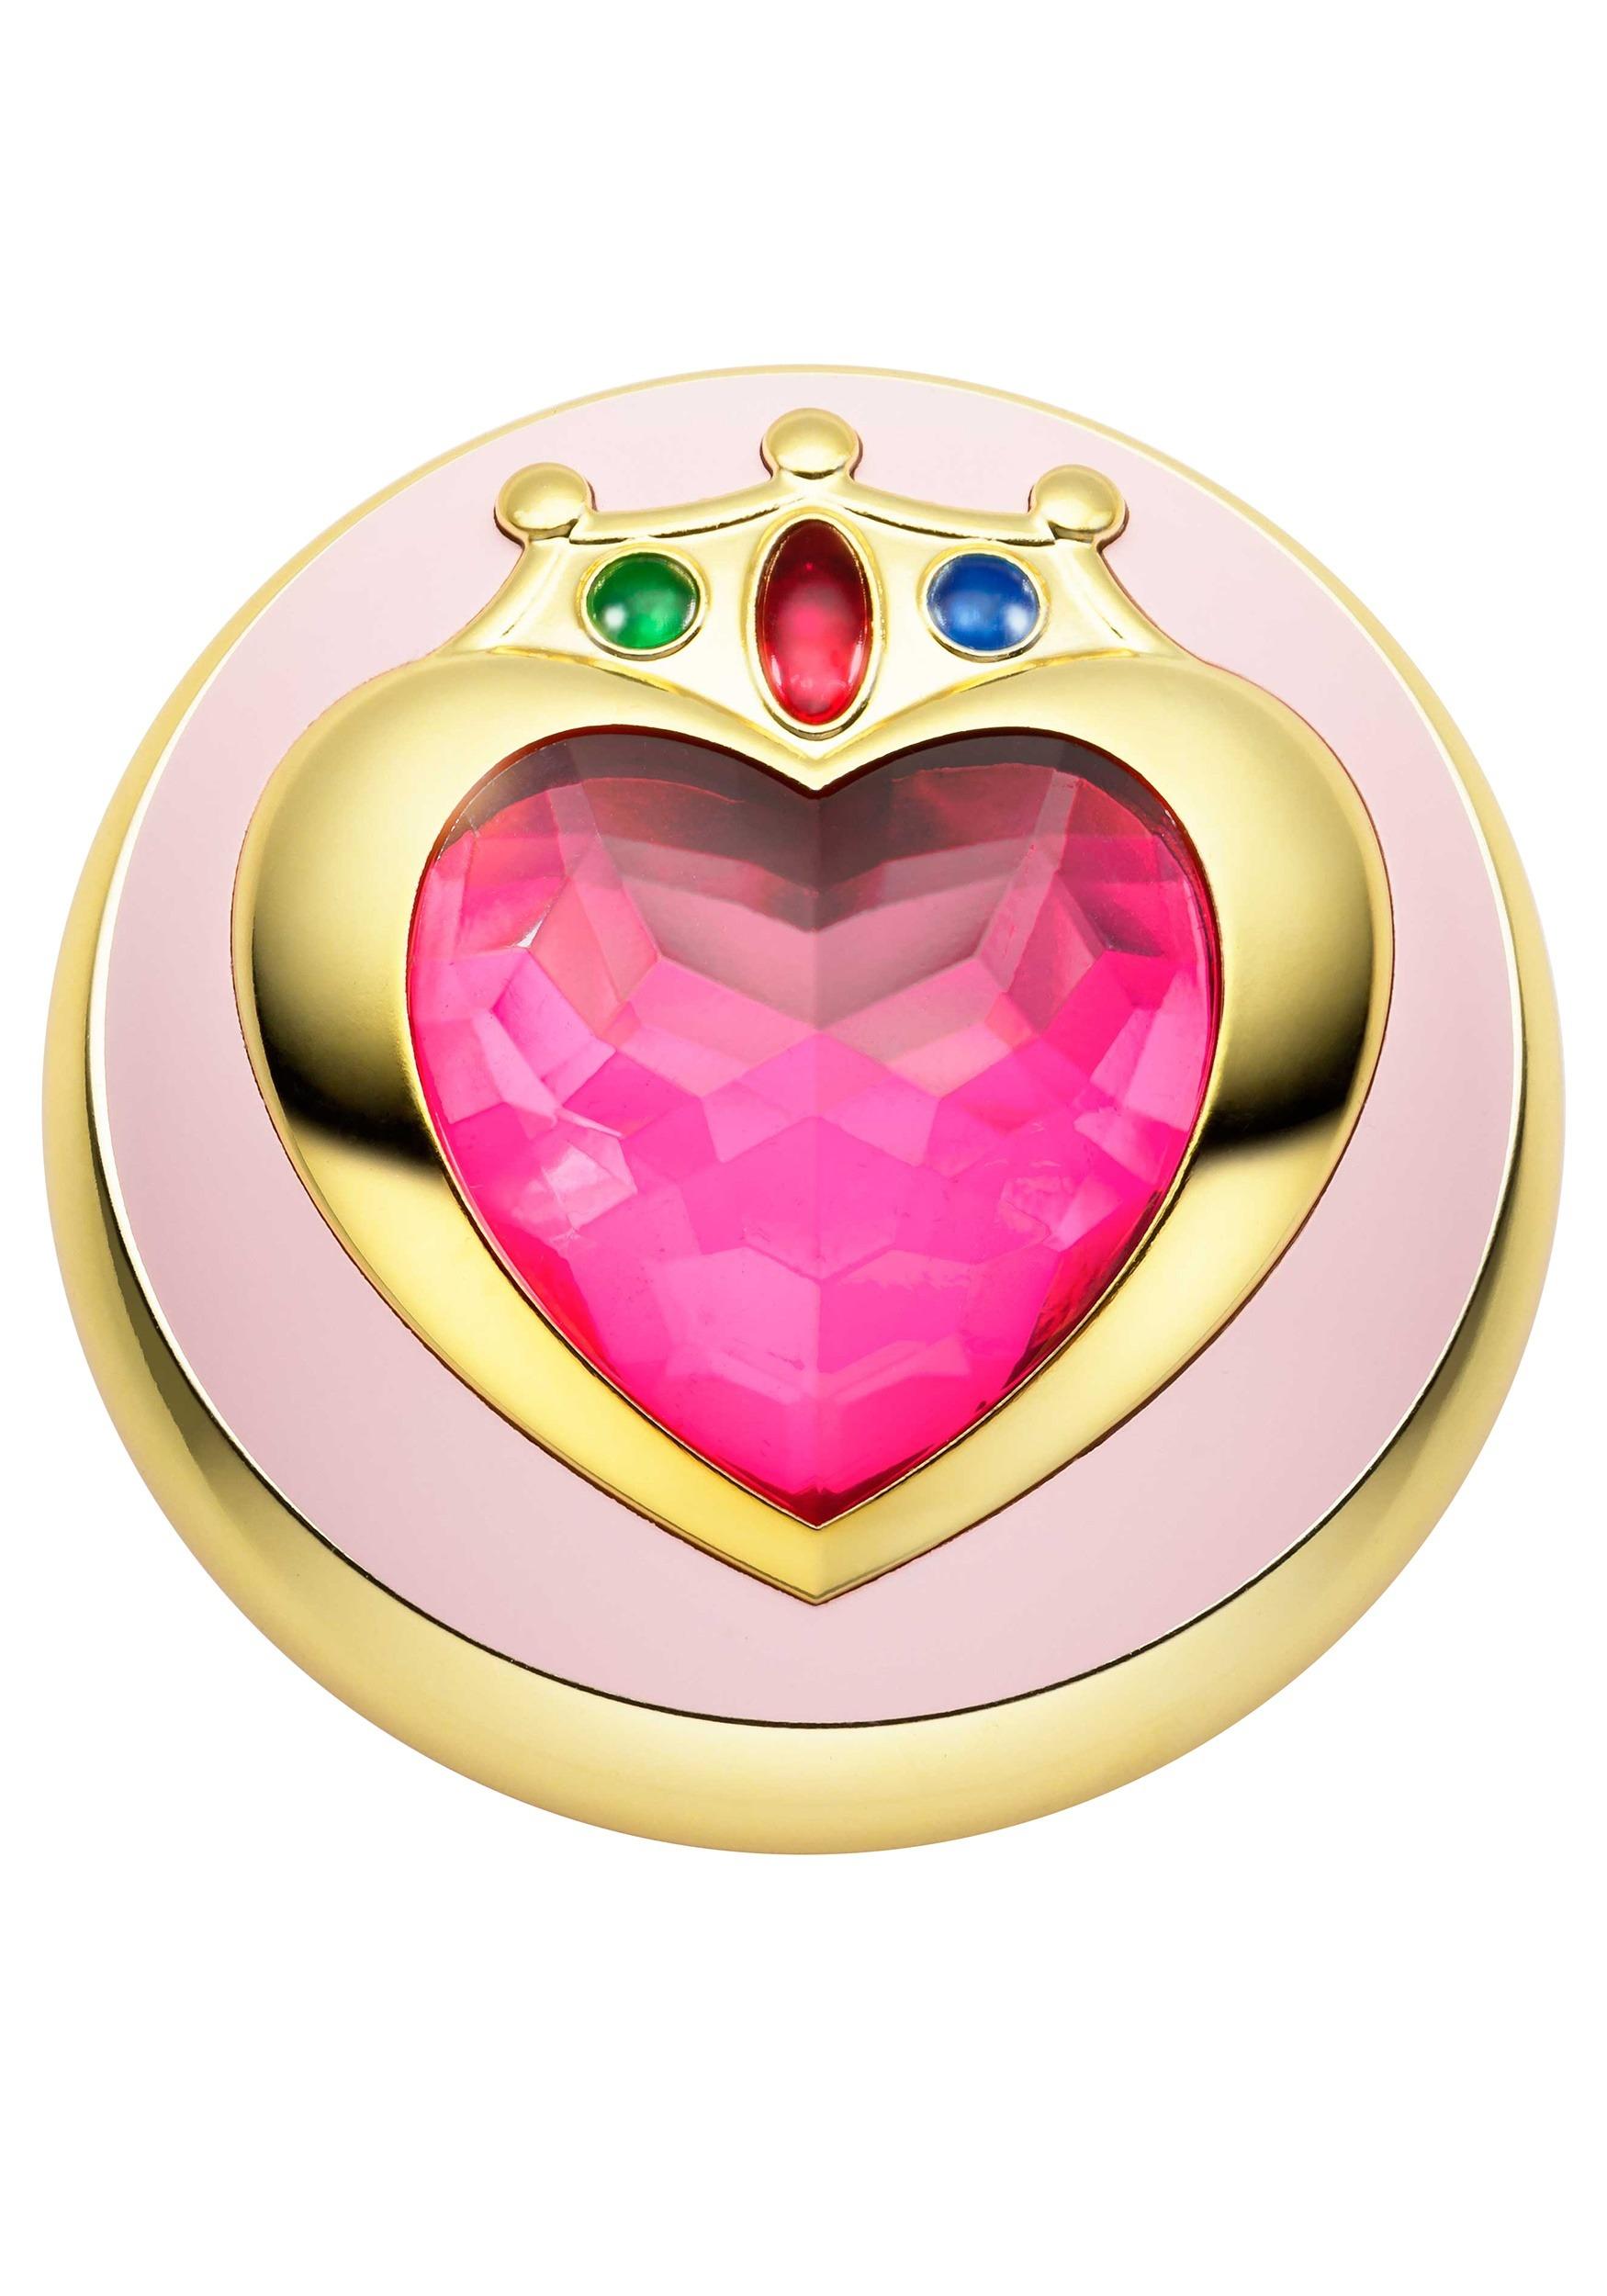 Prism_Heart_Compact_Sailor_Chibi_Moon_Bandai_Proplica